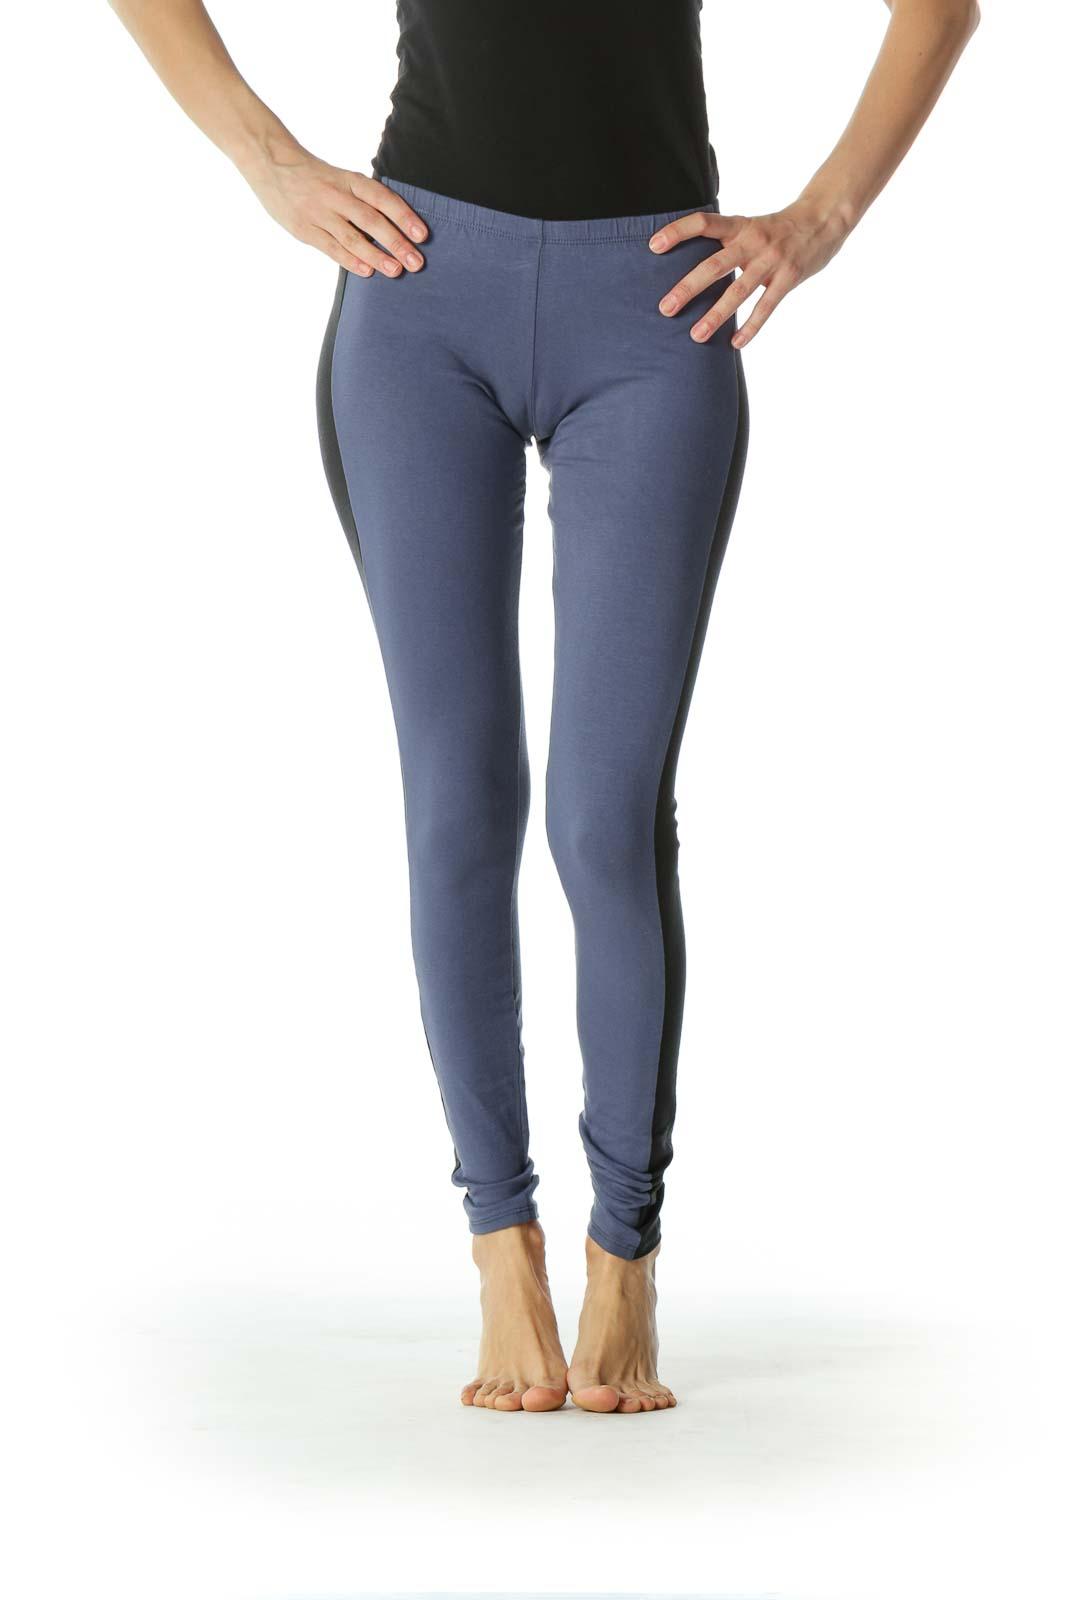 Blue and Black Stripes Legging  Front